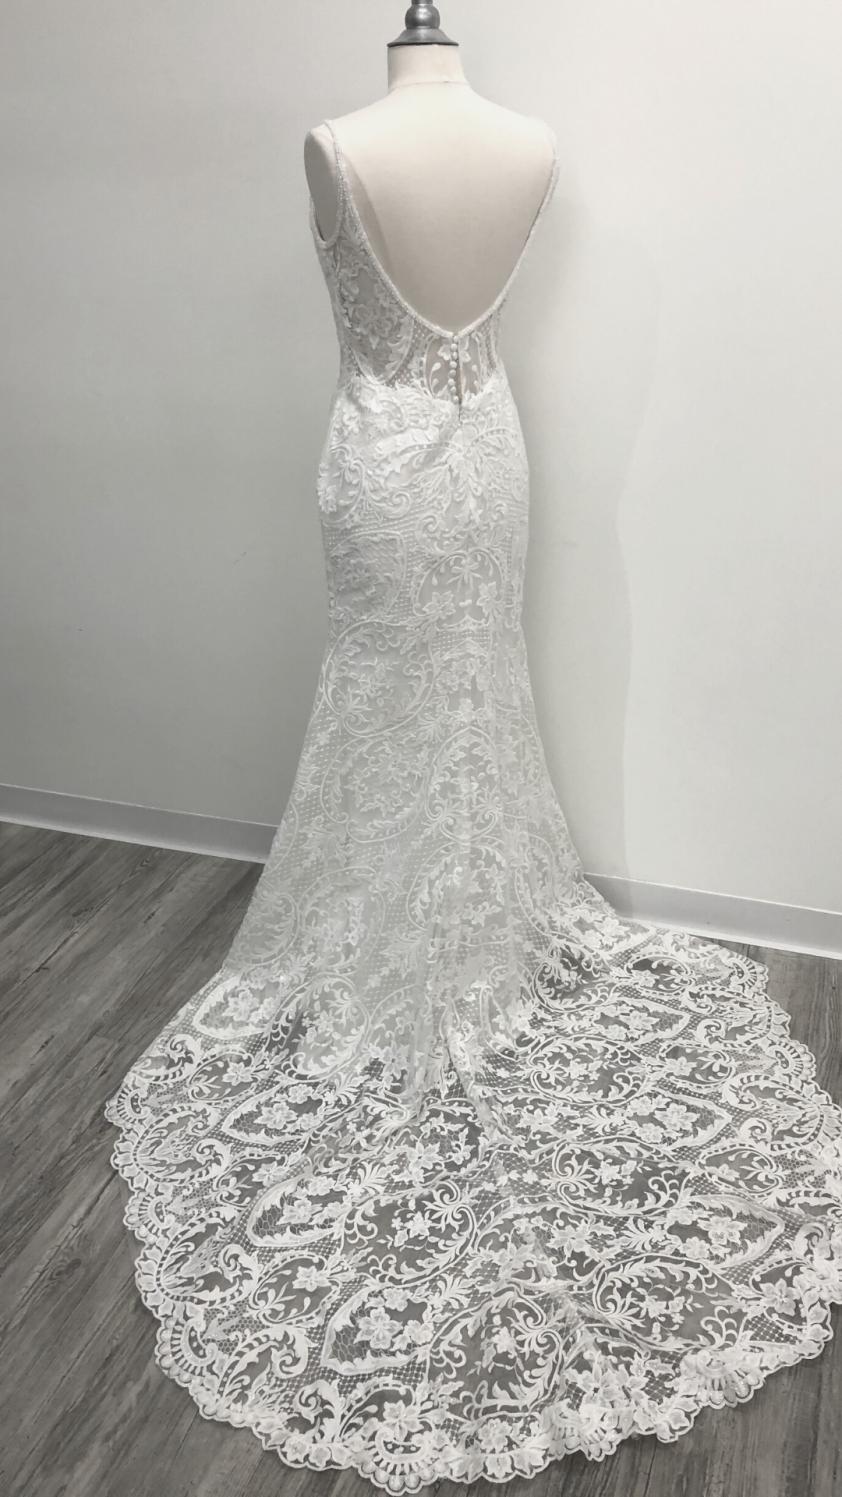 Wedding Dress Magnolia - Dominique Levesque Bridal